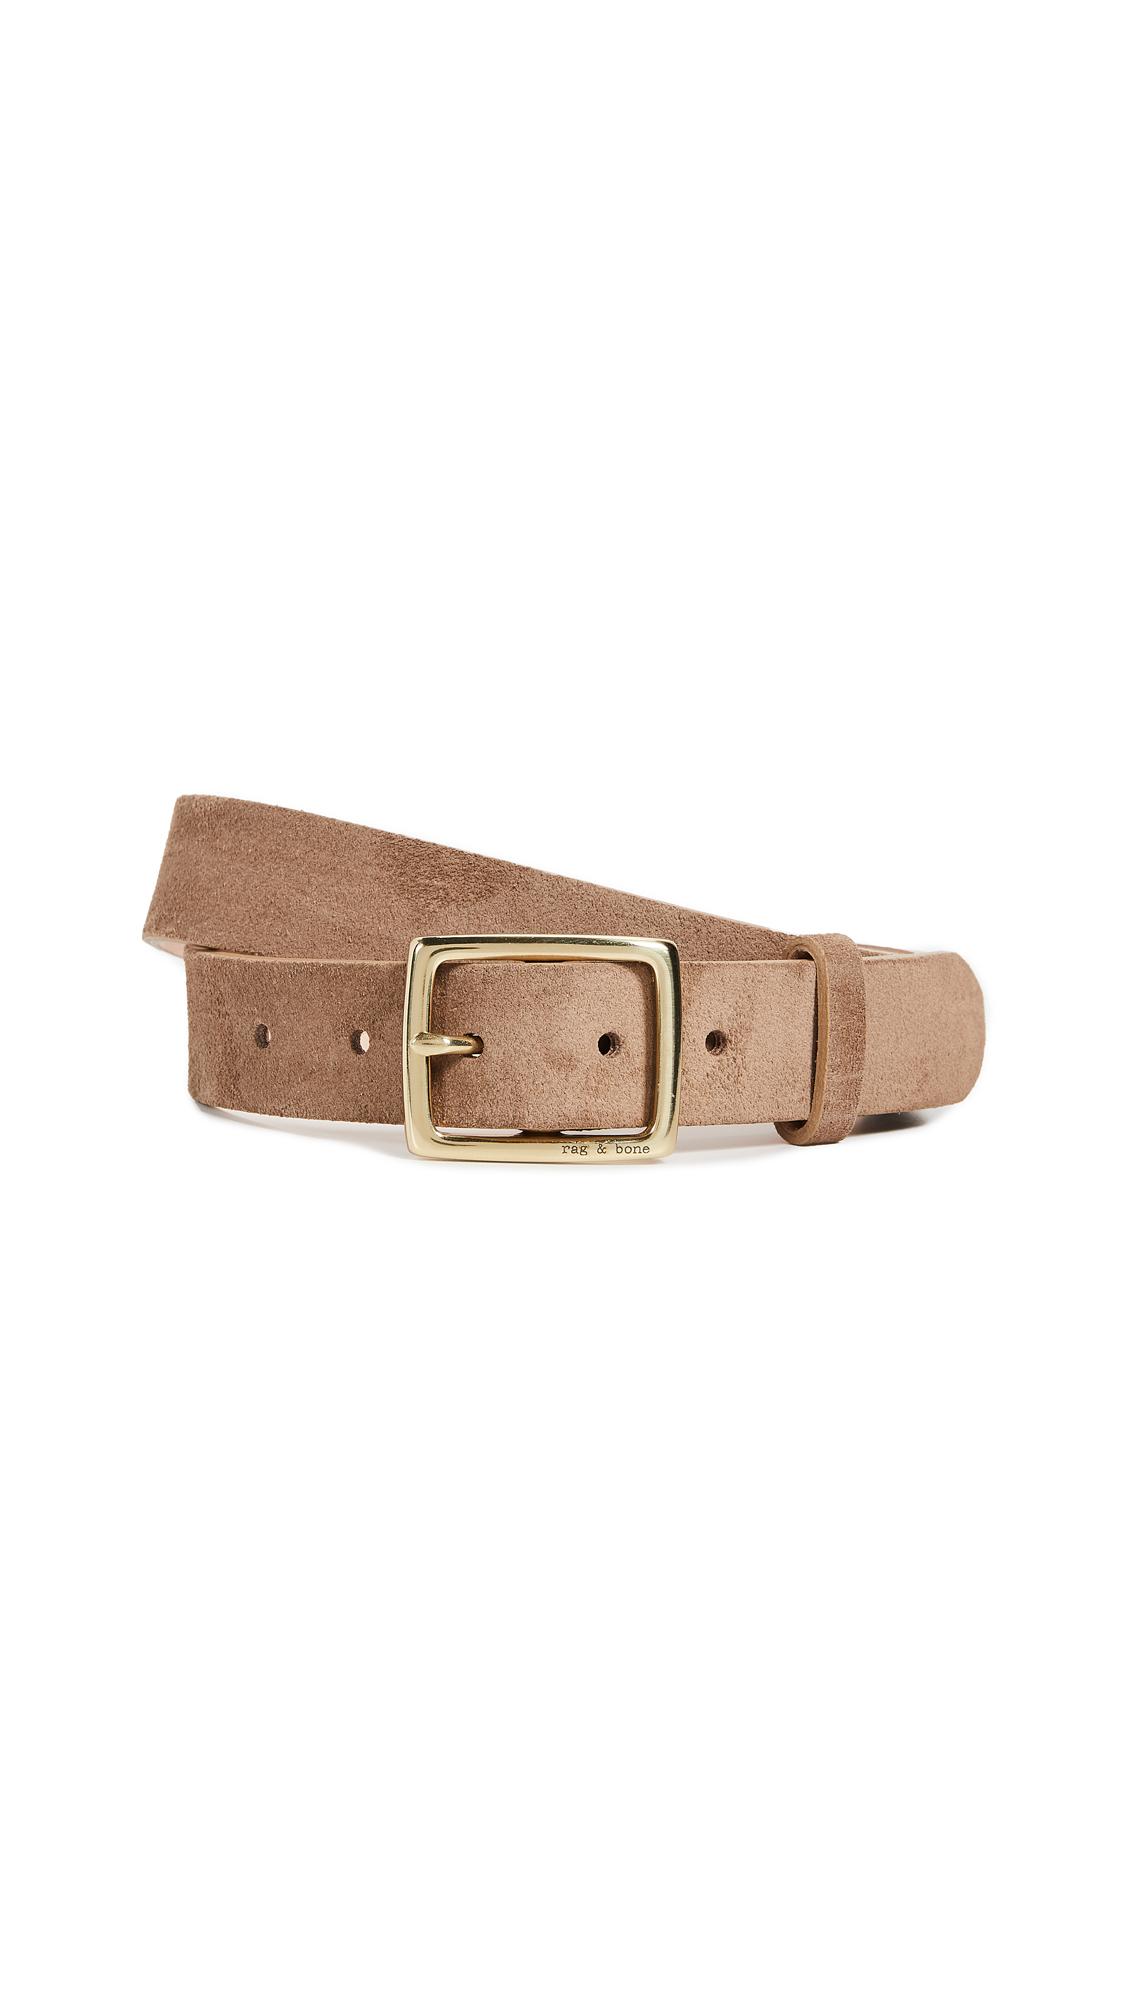 Rag & Bone Boyfriend Belt - Camel